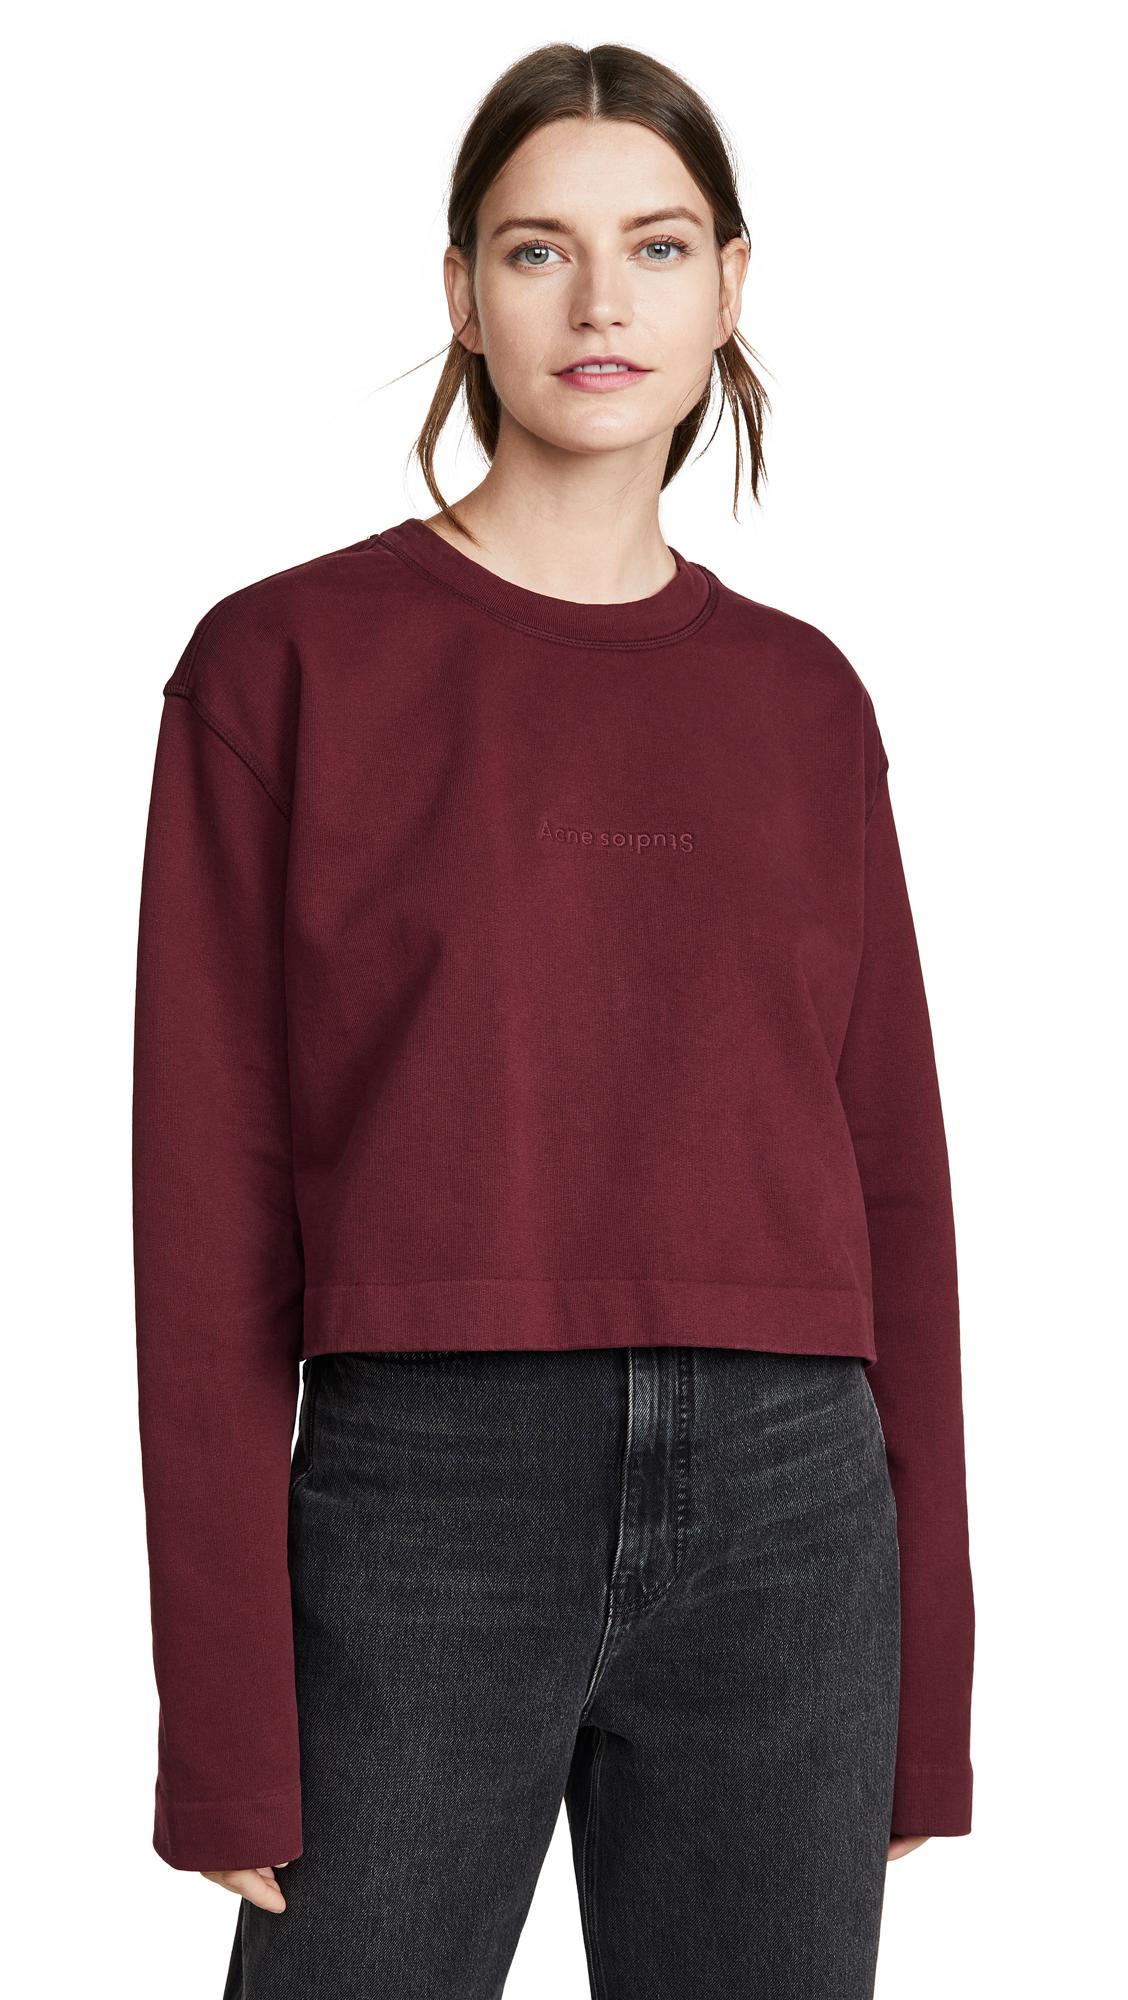 Acne Studios Odice Emboss Sweatshirt - Chocolate Brown